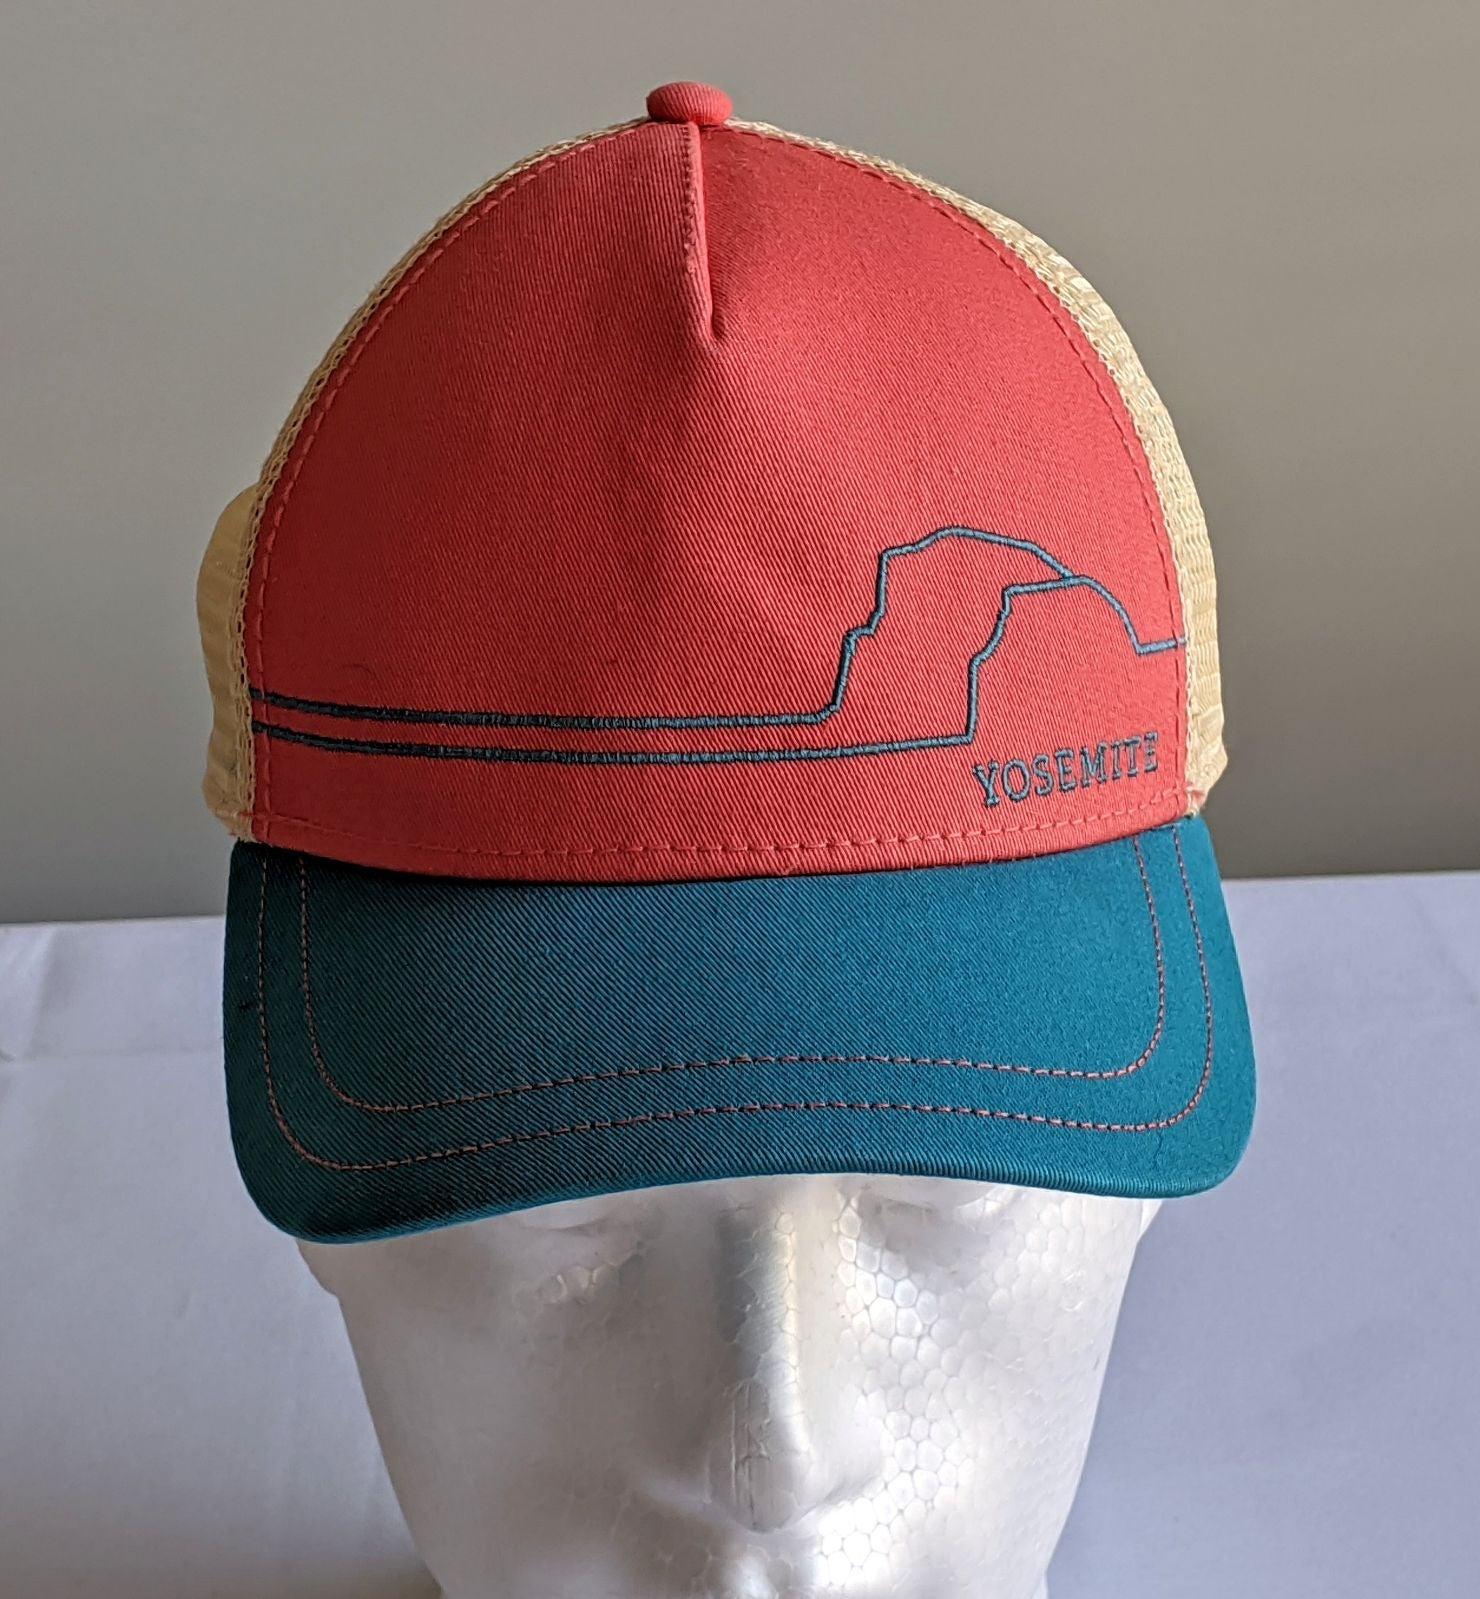 YOSEMITE National Park Meshback Hat